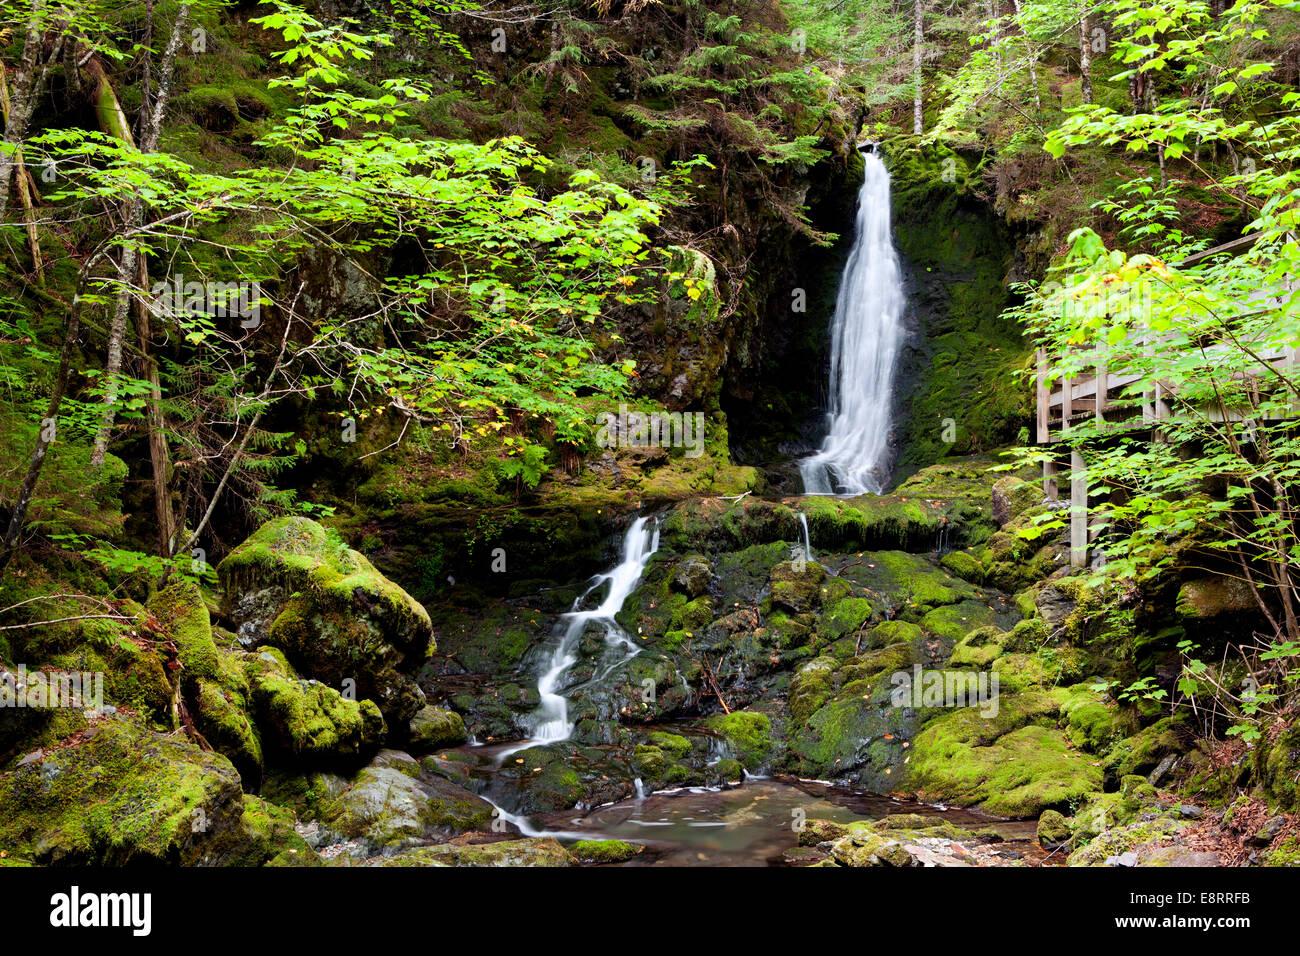 Dickson Falls Trail - Fundy National Park - near Alma, New Brunswick, Canada - Stock Image